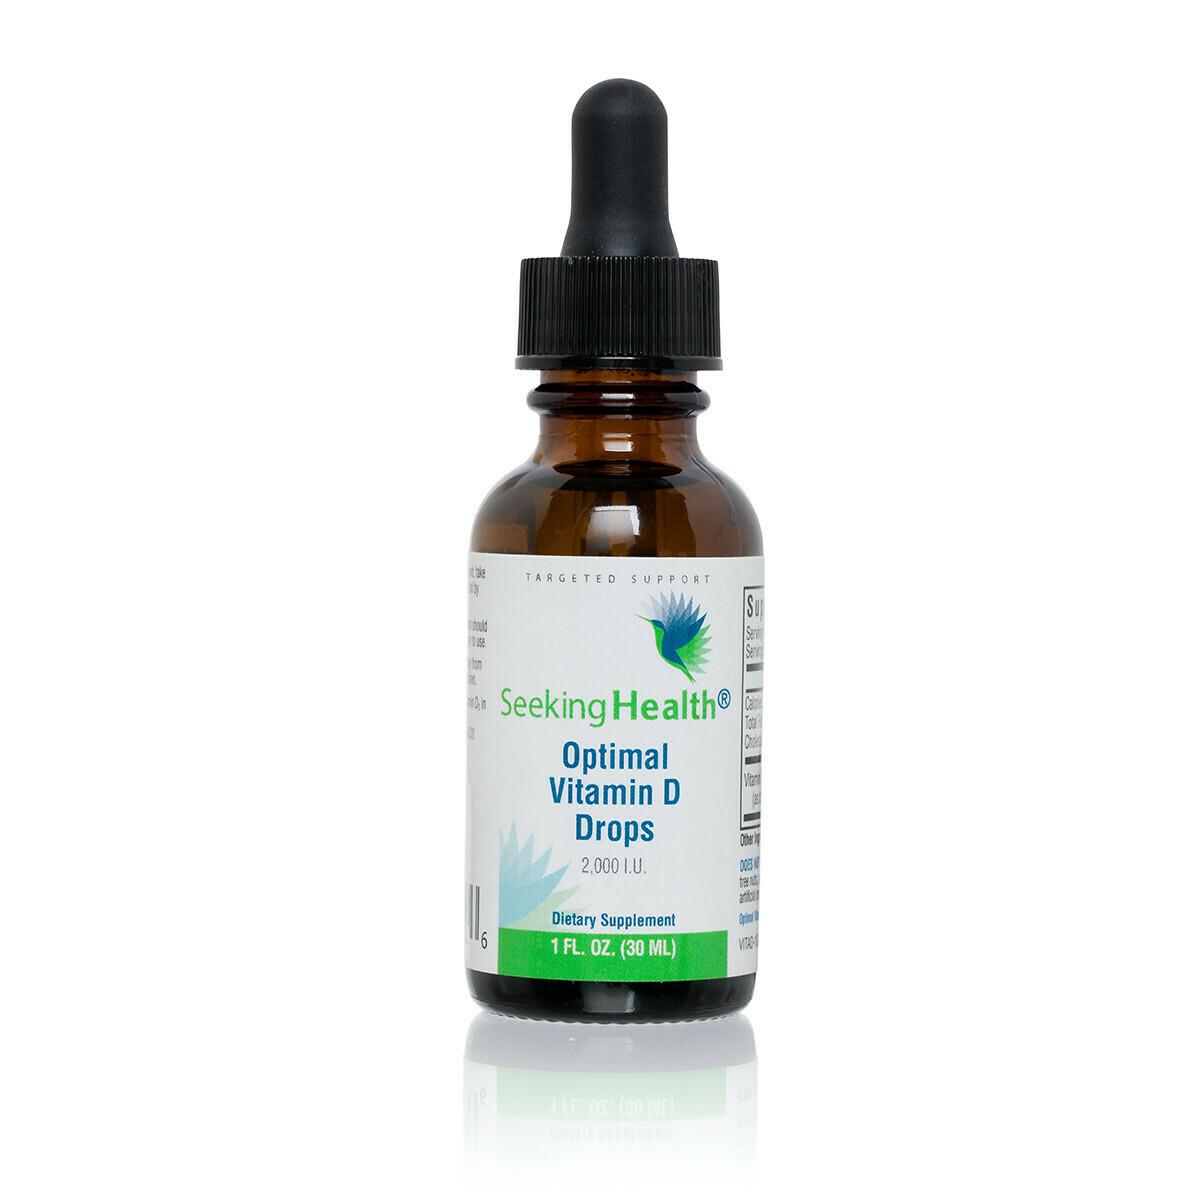 OPTIMAL VITAMIN D DROPS  30 ml Seeking Health